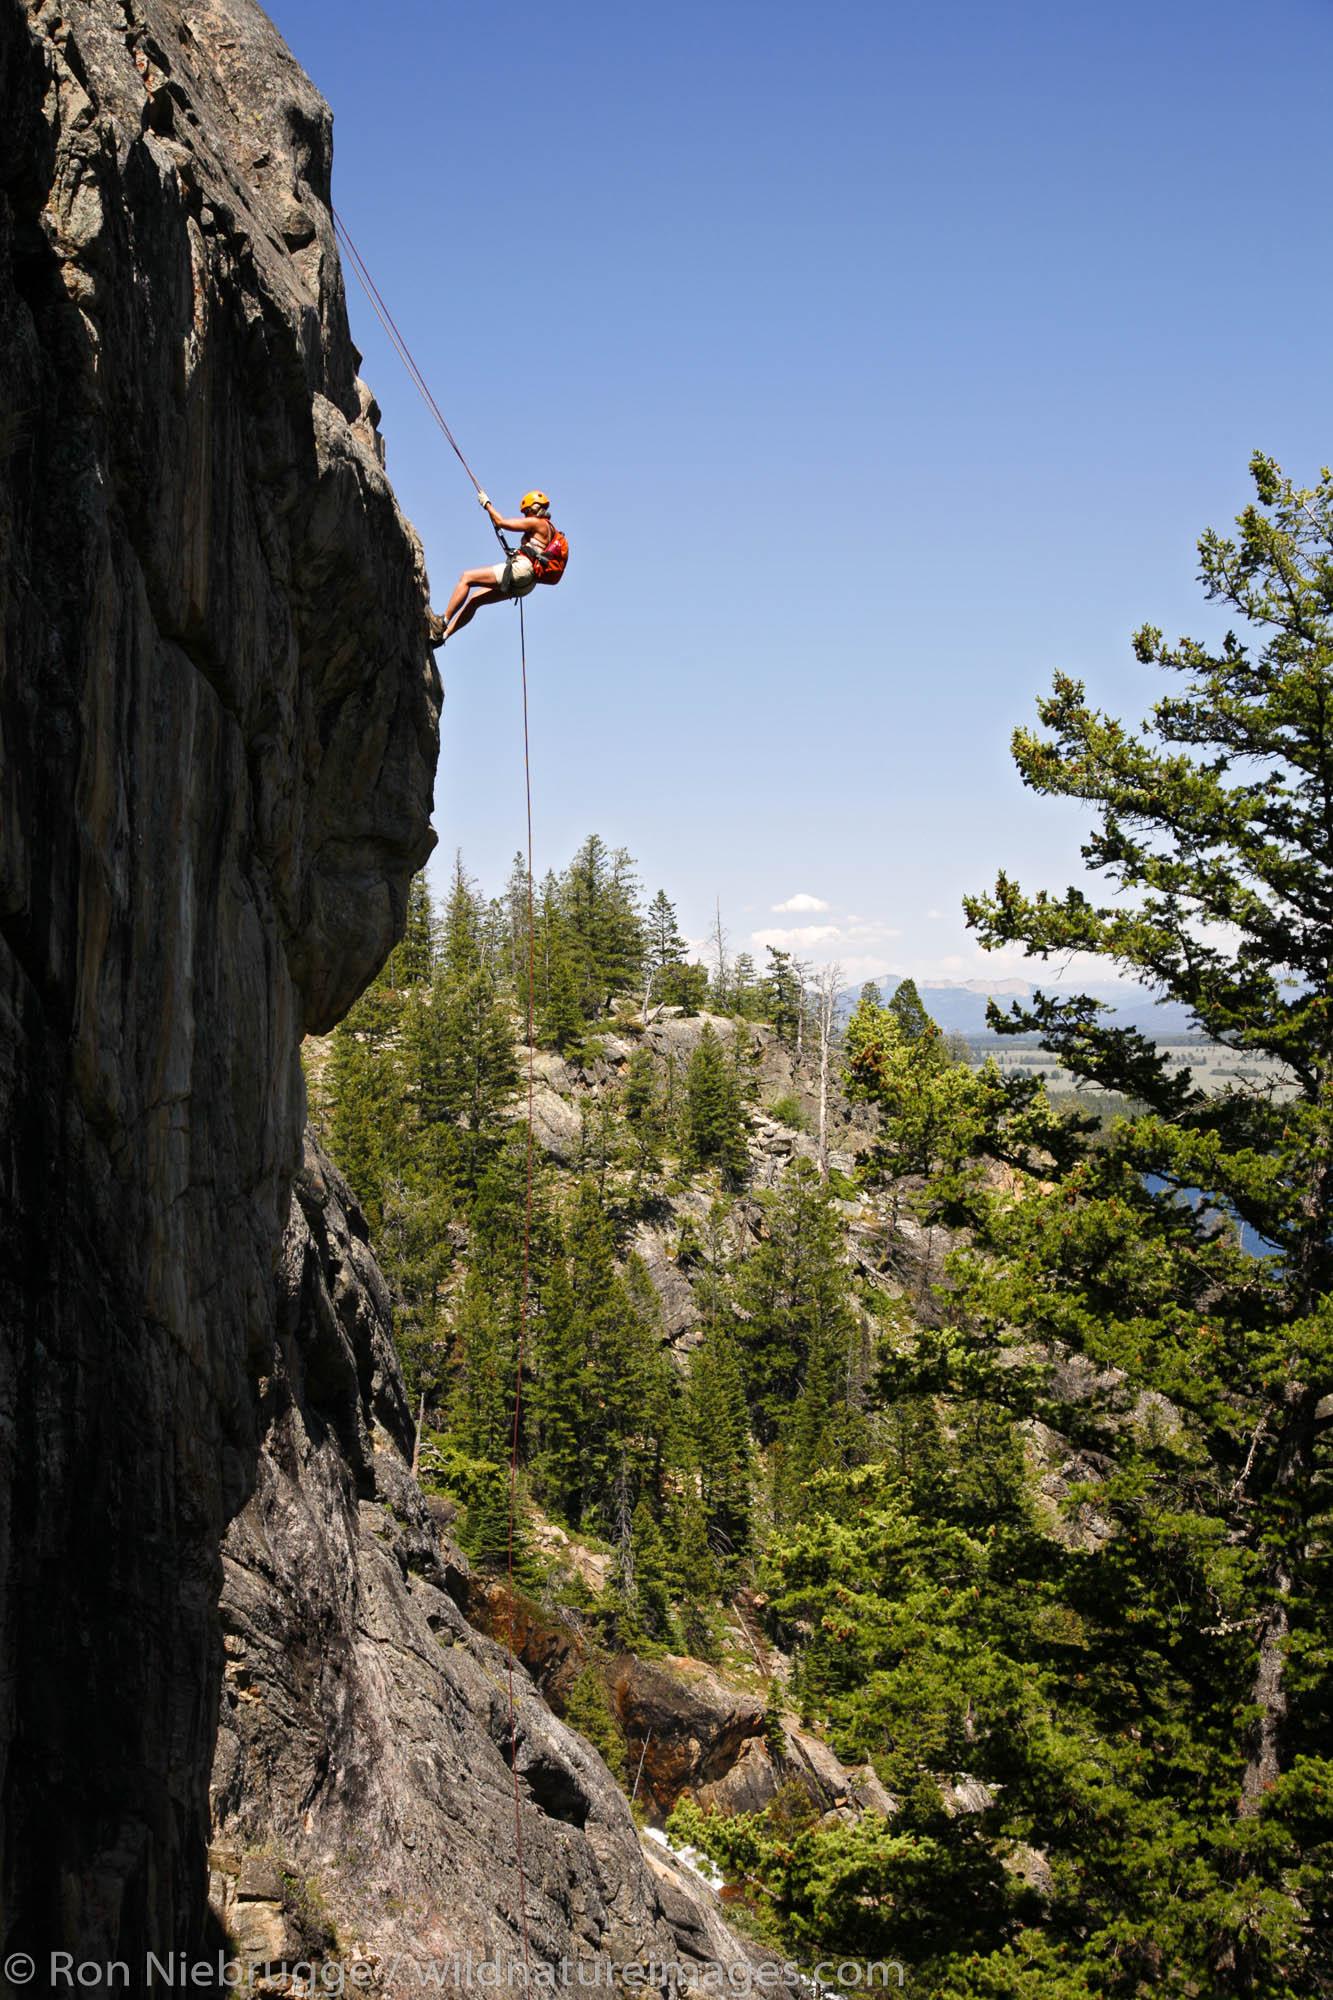 Rock climbing near Hidden Falls with Exum Mountain Guides, Grand Teton National Park, Wyoming. (MR)